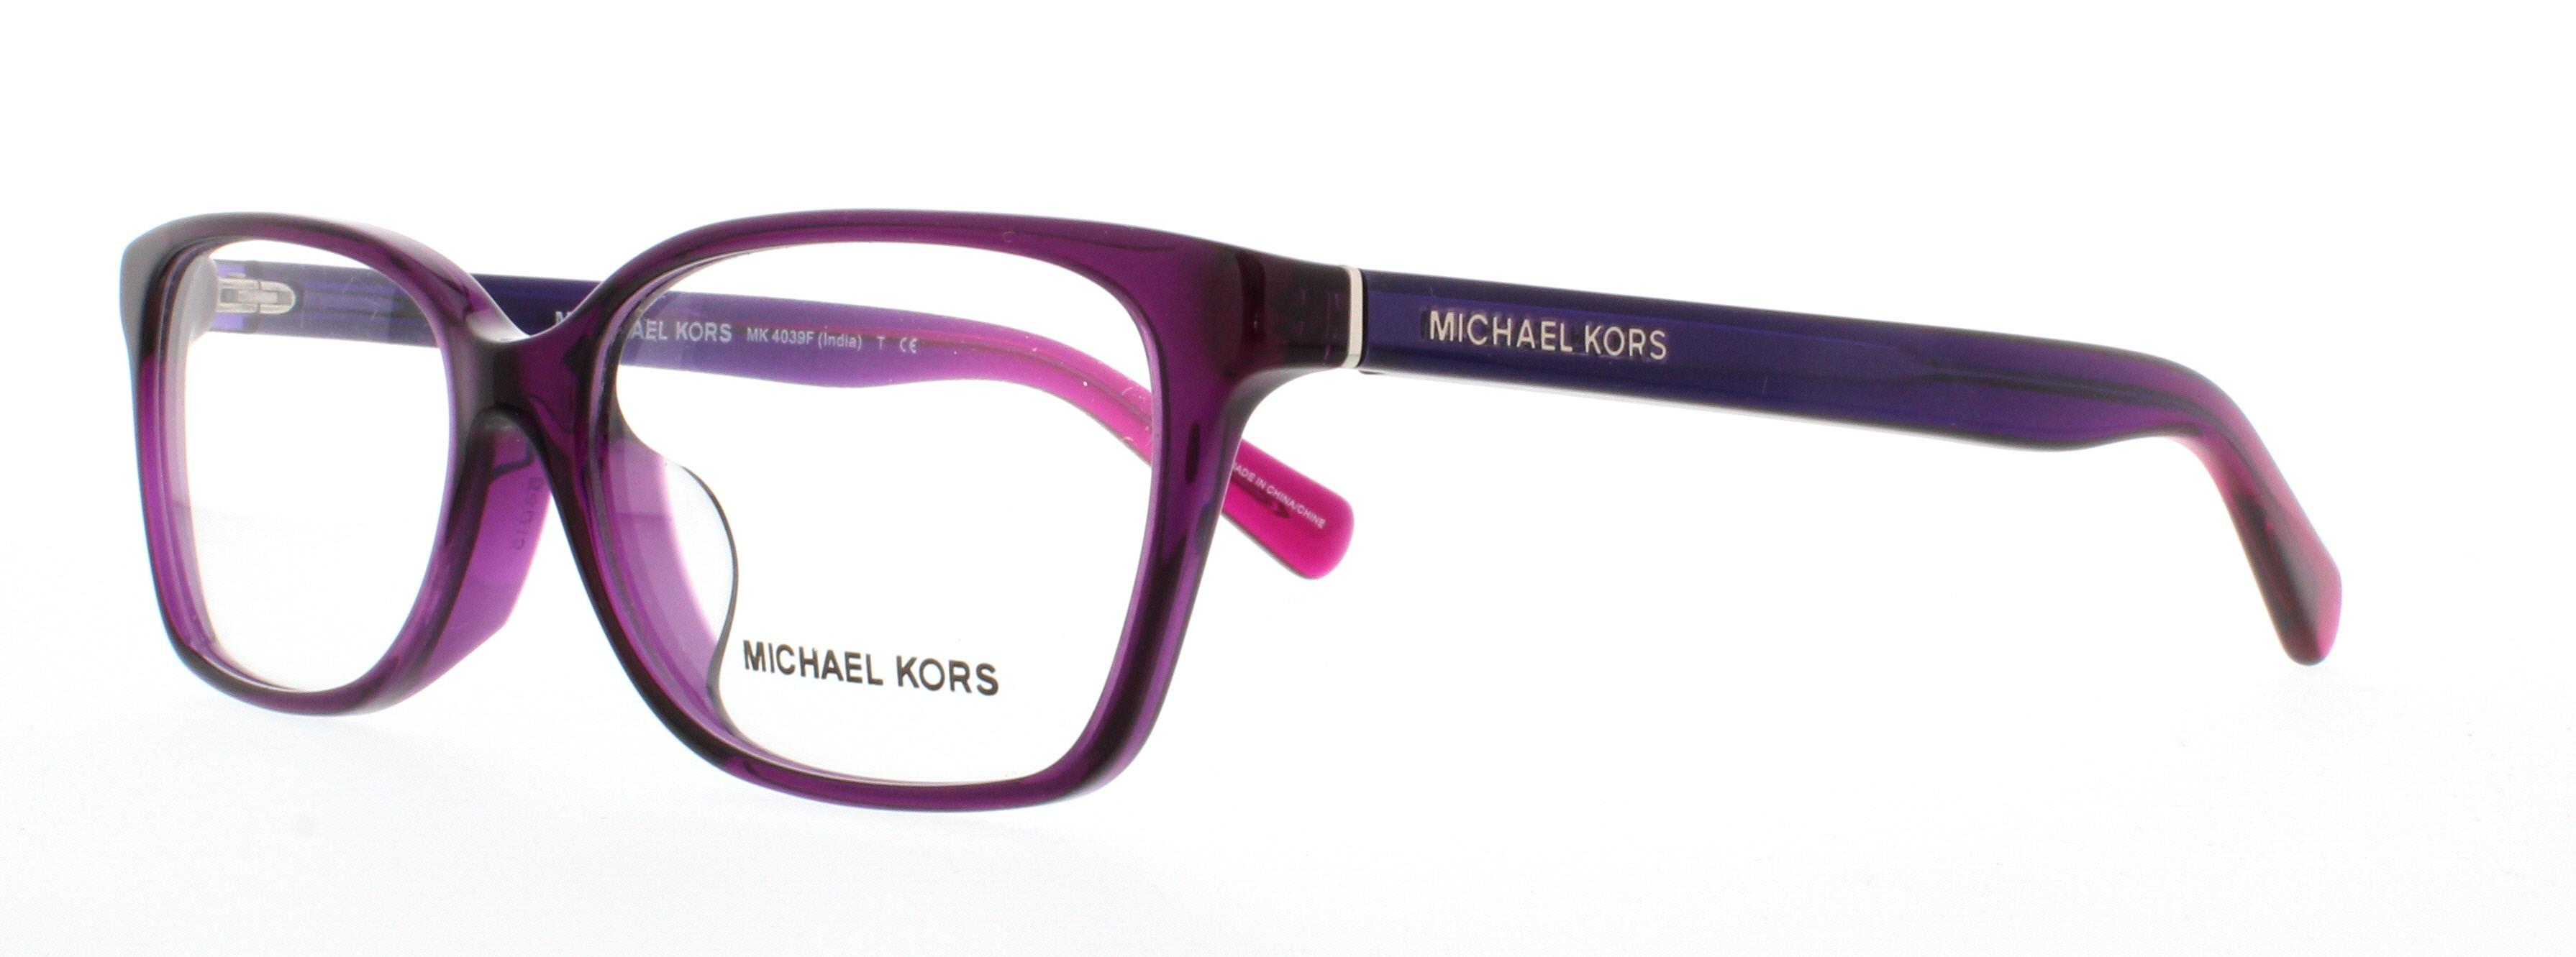 MICHAEL KORS Eyeglasses MK4039F INDIA (F) 3222 Transparent Purple ...